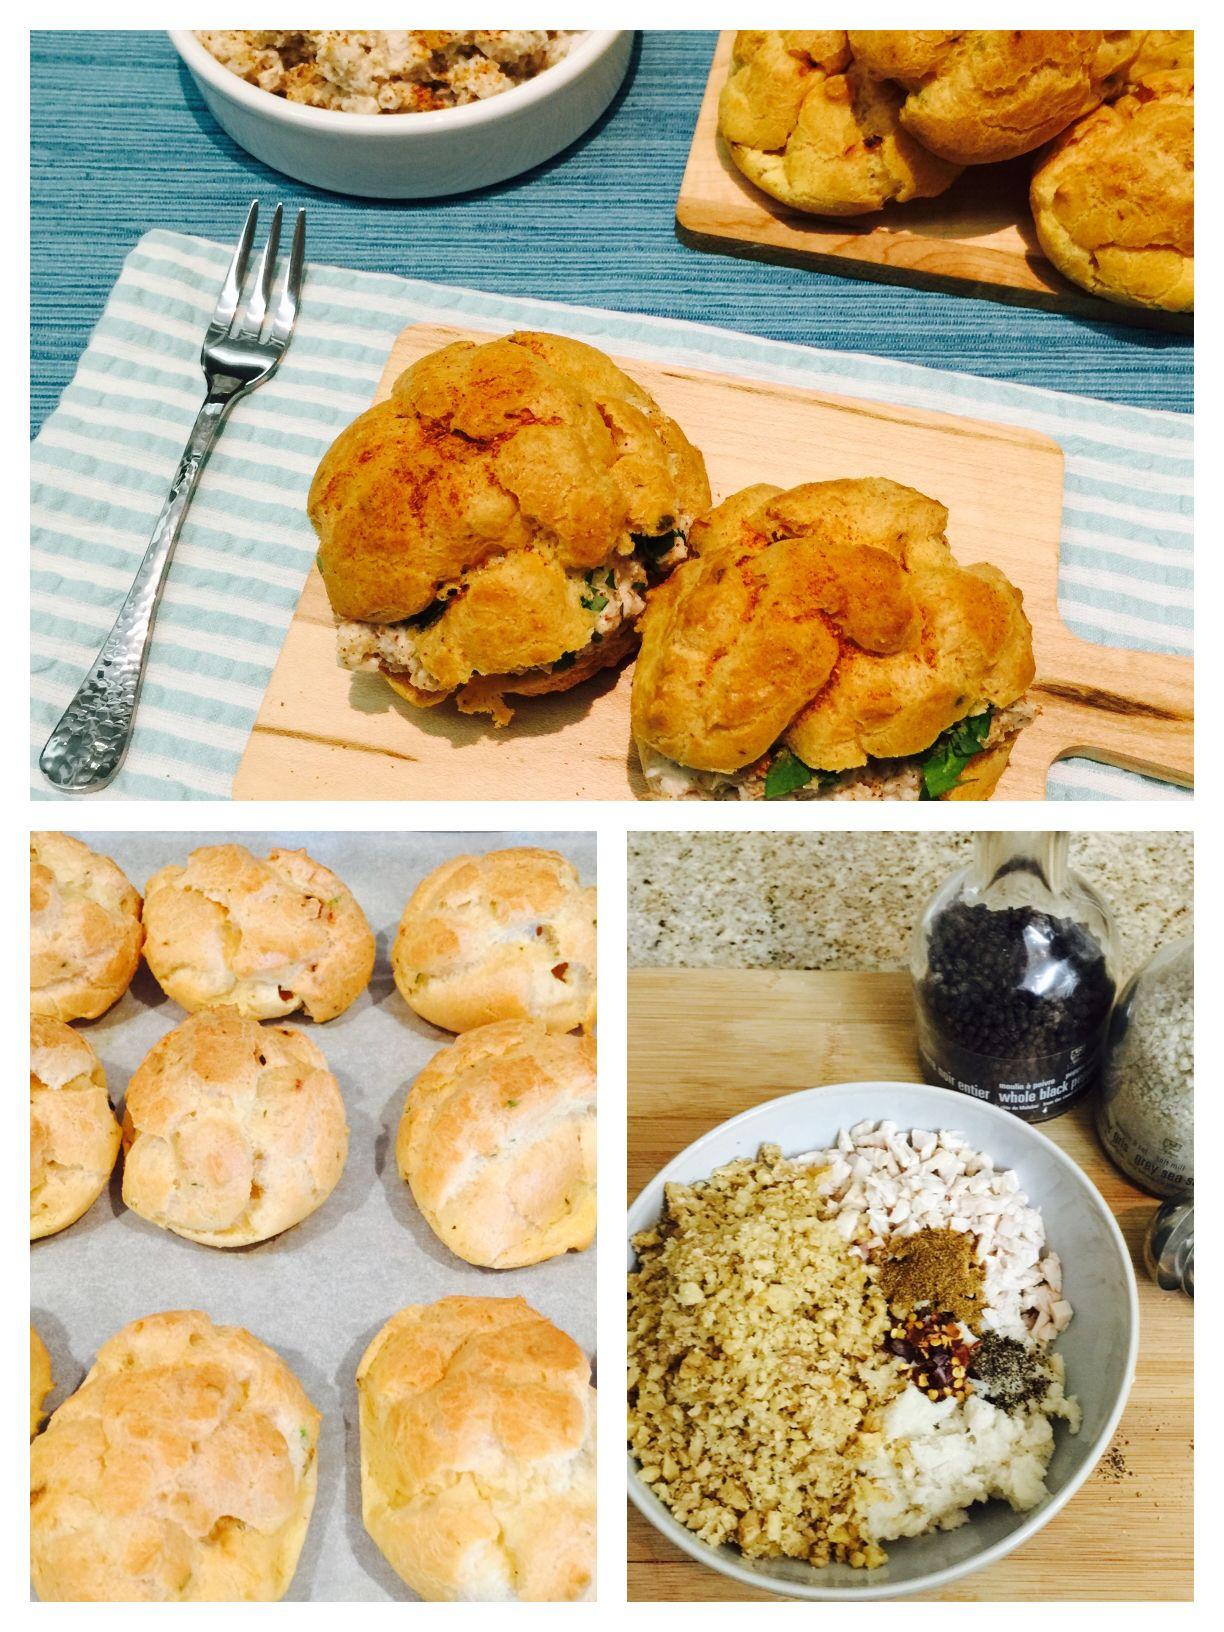 Circassian chicken choux puffs   #UAEbloggers #fdbloggers #delicious #yummy #chouxpuff  Recipe at http://www.tantalisemytastebuds.com